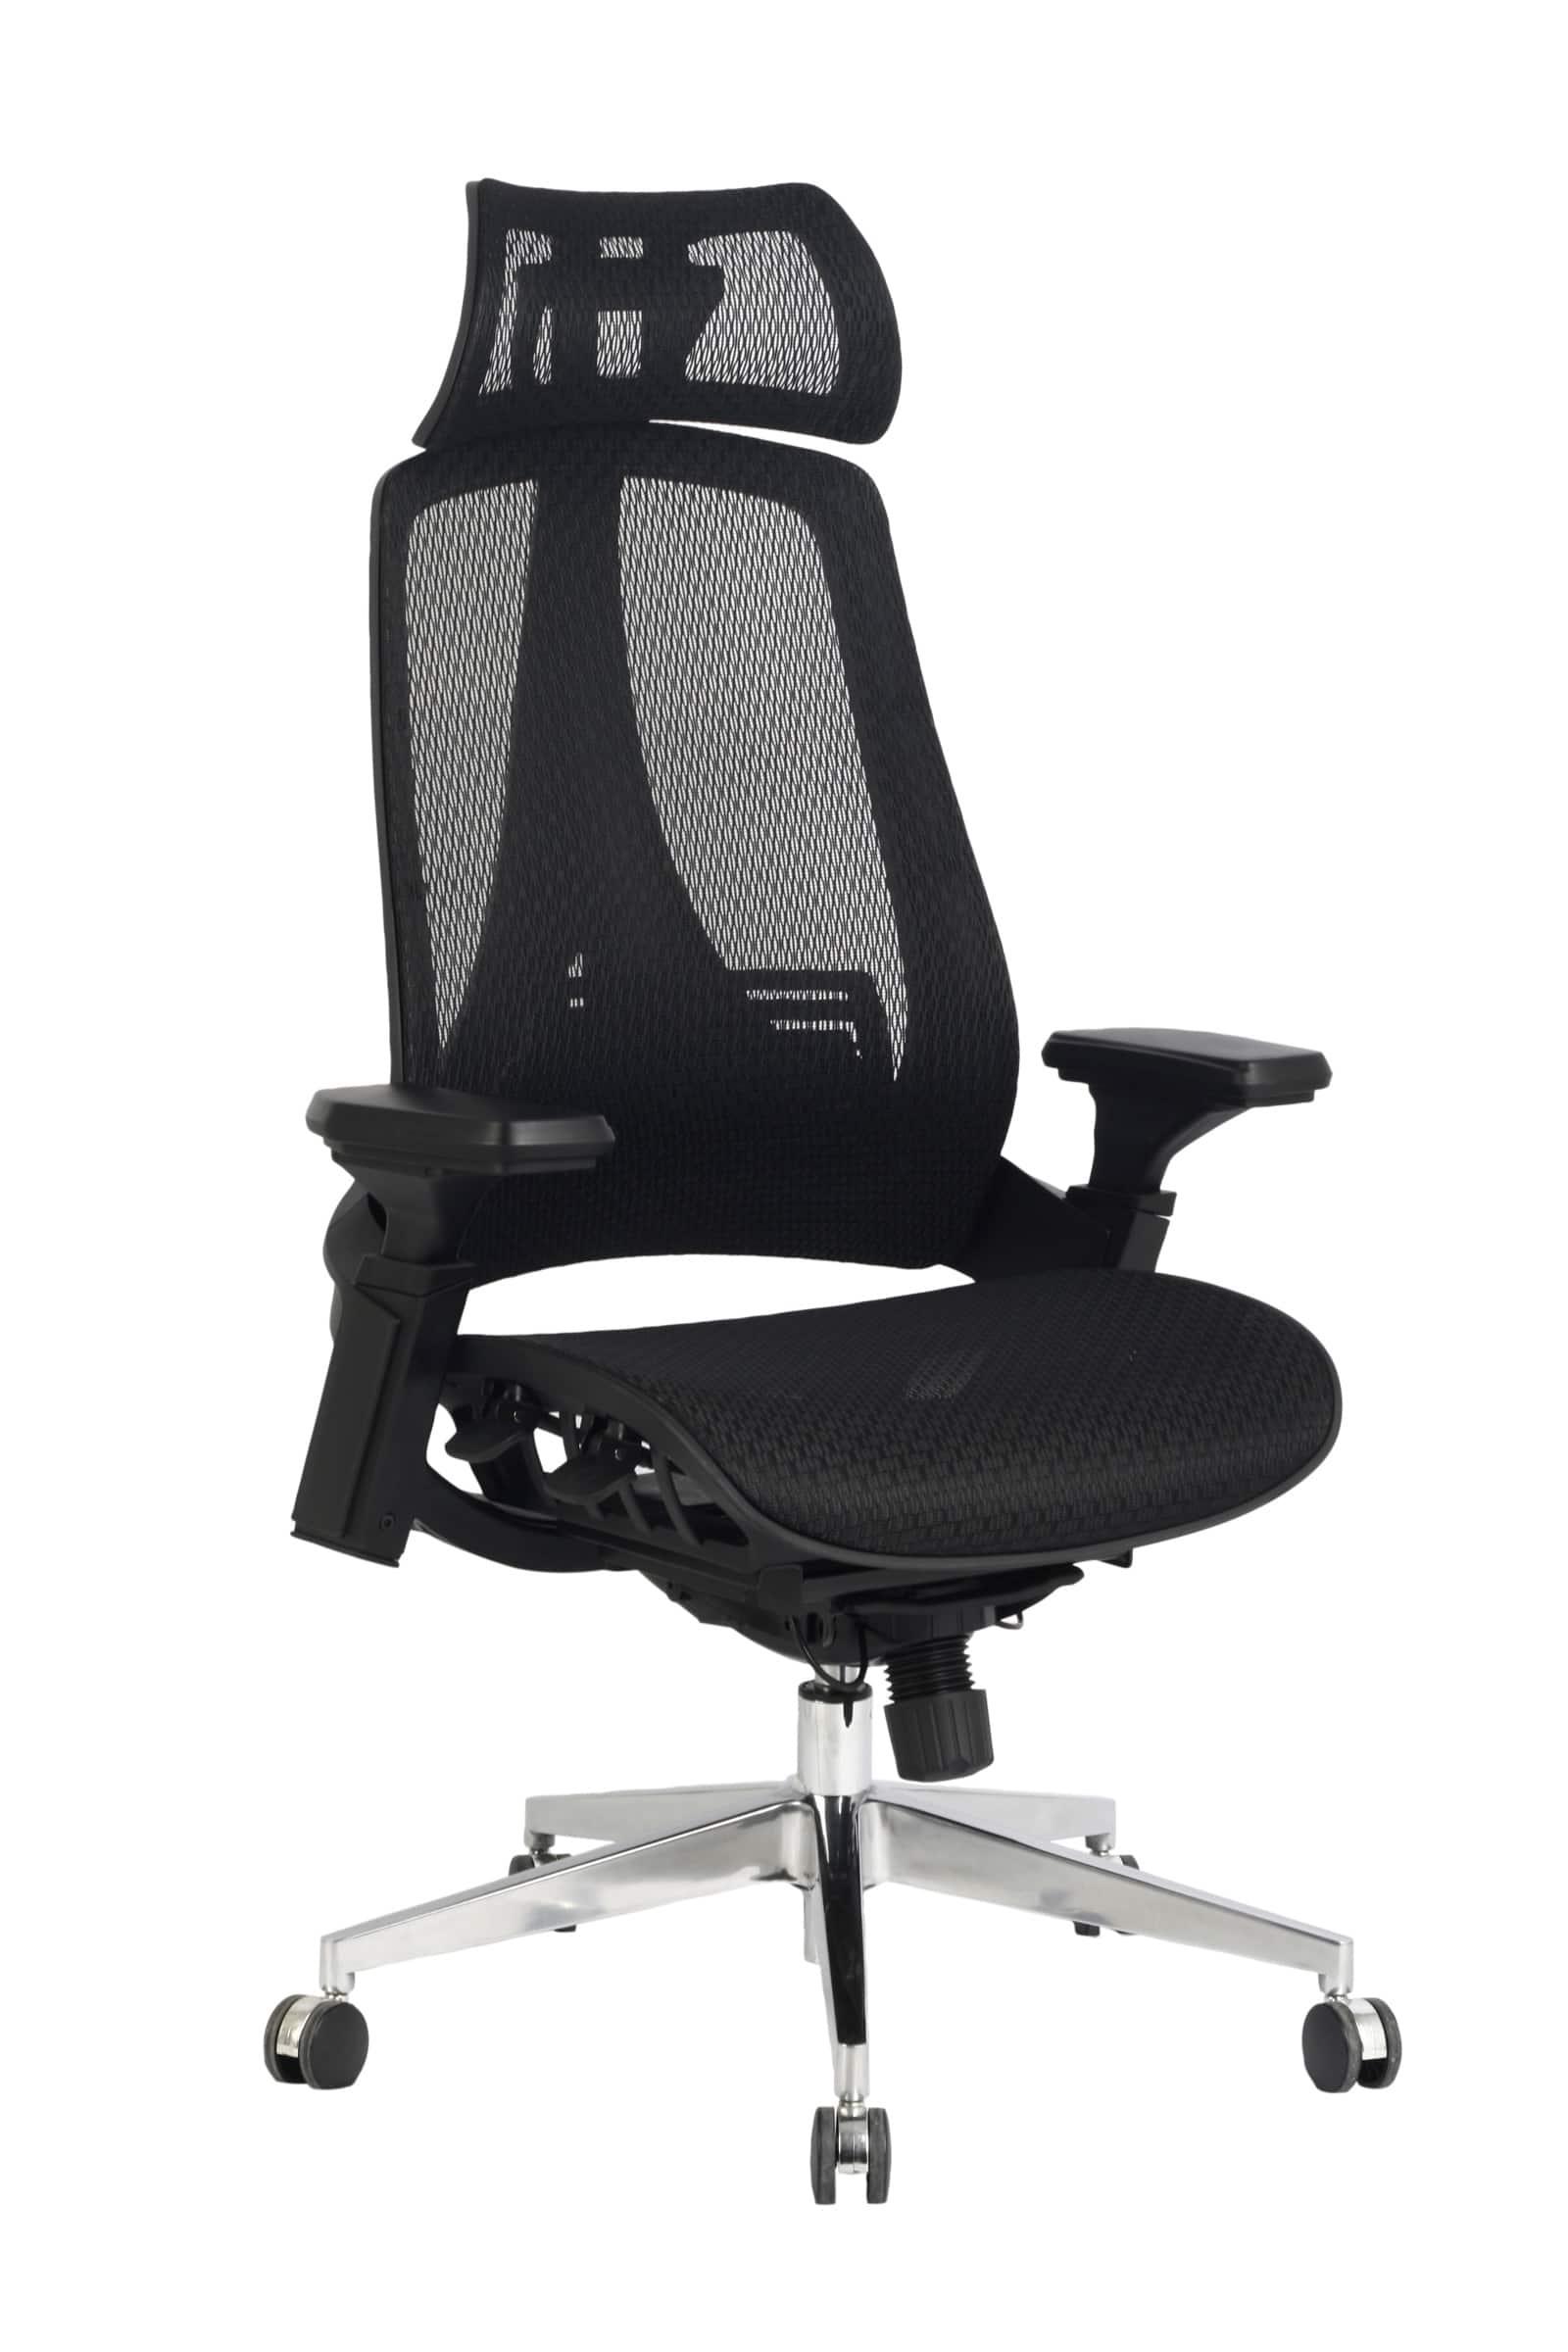 ergonomic mesh office chair uk covers bulk lansdowne high back posture  unique postural